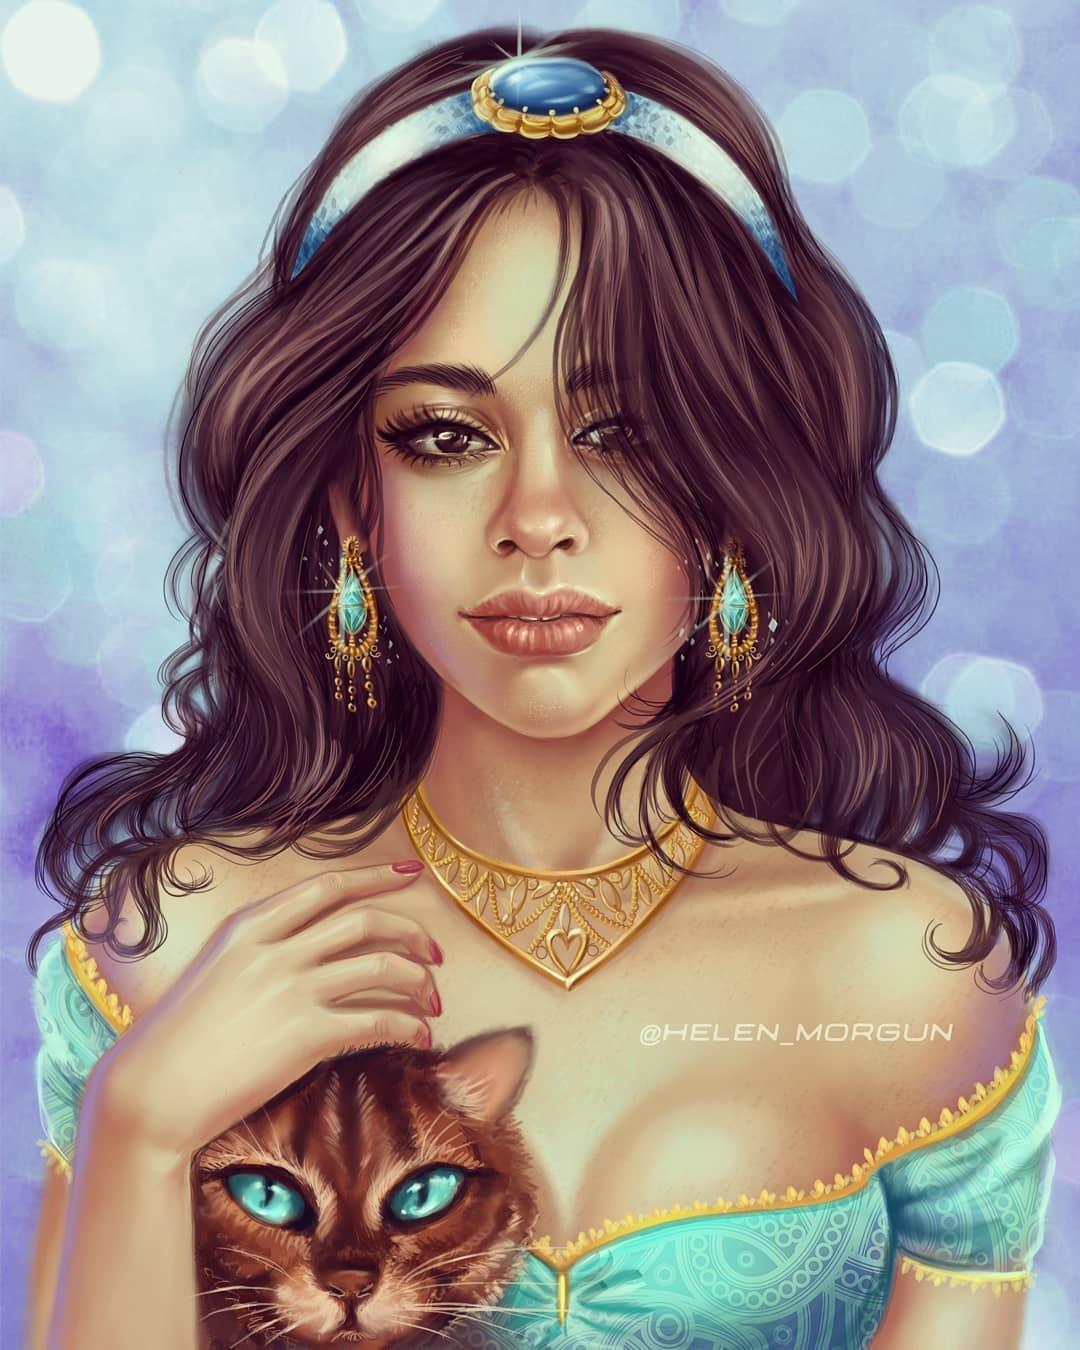 Artist Transforms Female Celebrities Into Disney Princesses